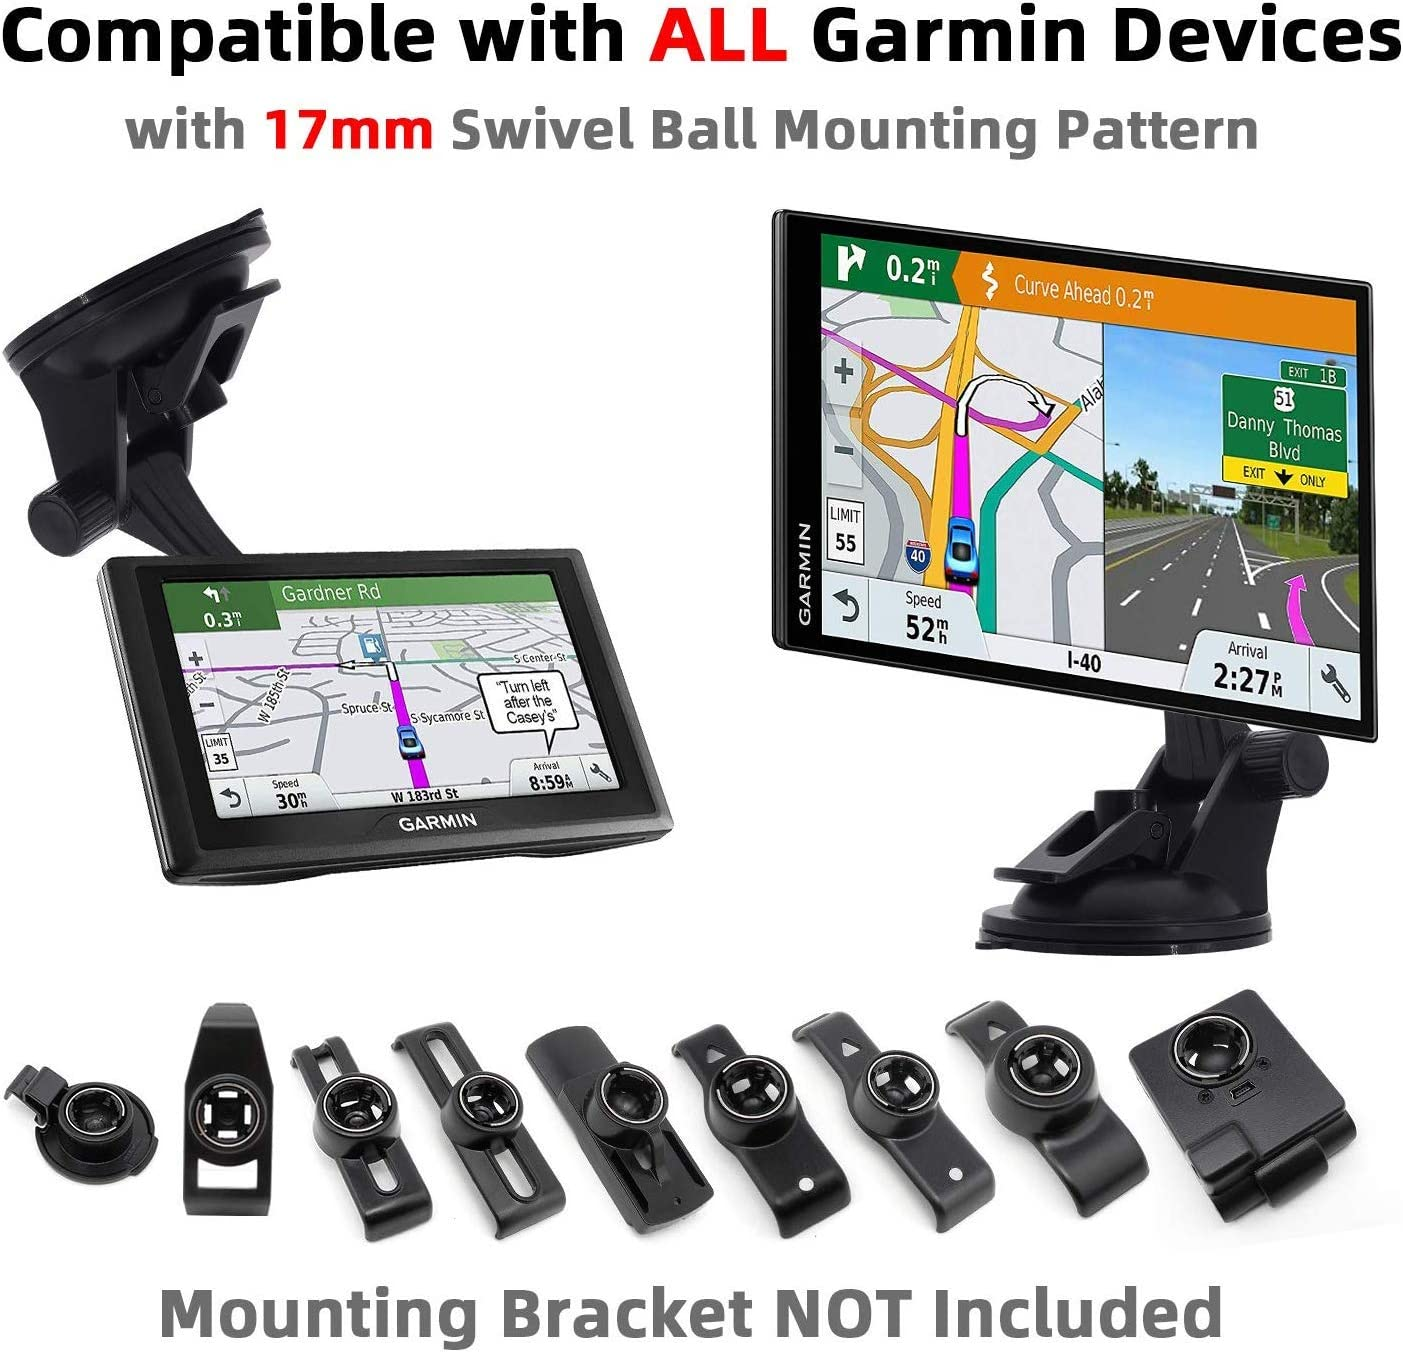 Universal Mount Bracket//Clip for Garmin Nuvi 2639LMT 2689LMT 2699LMT 42LM 44 GPS